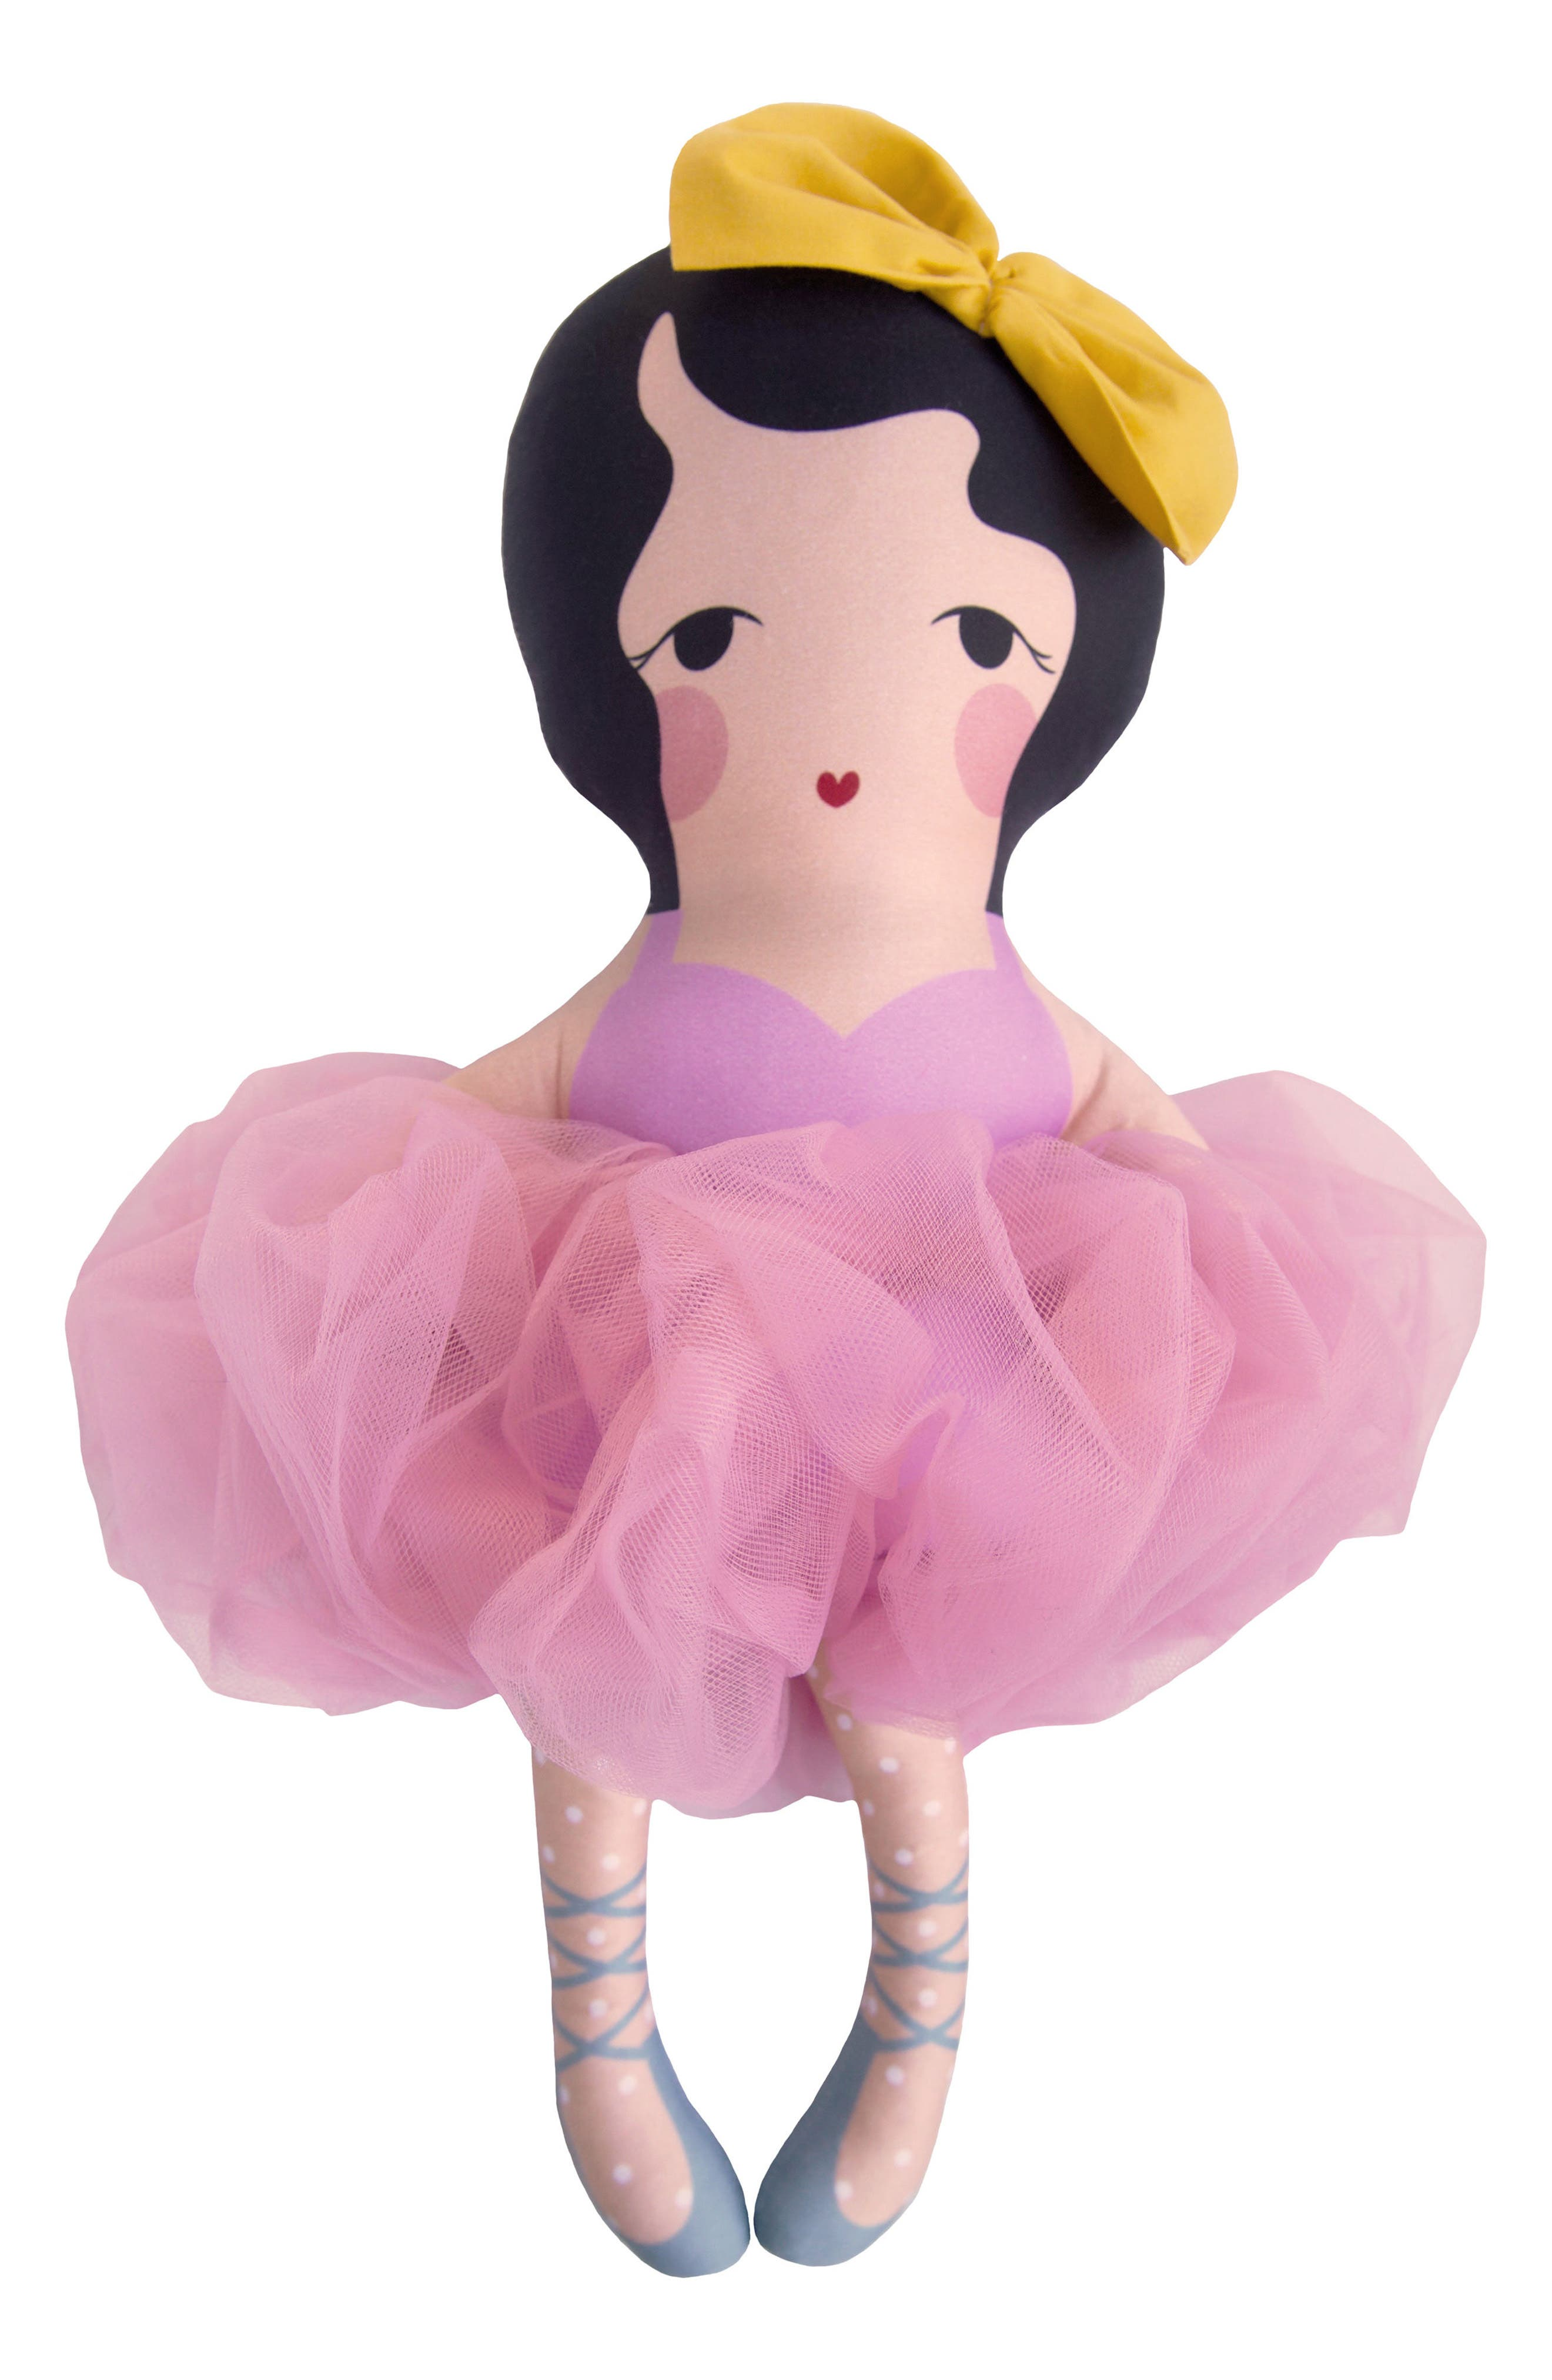 Candy Kirby Designs Sloan Ballerina Doll